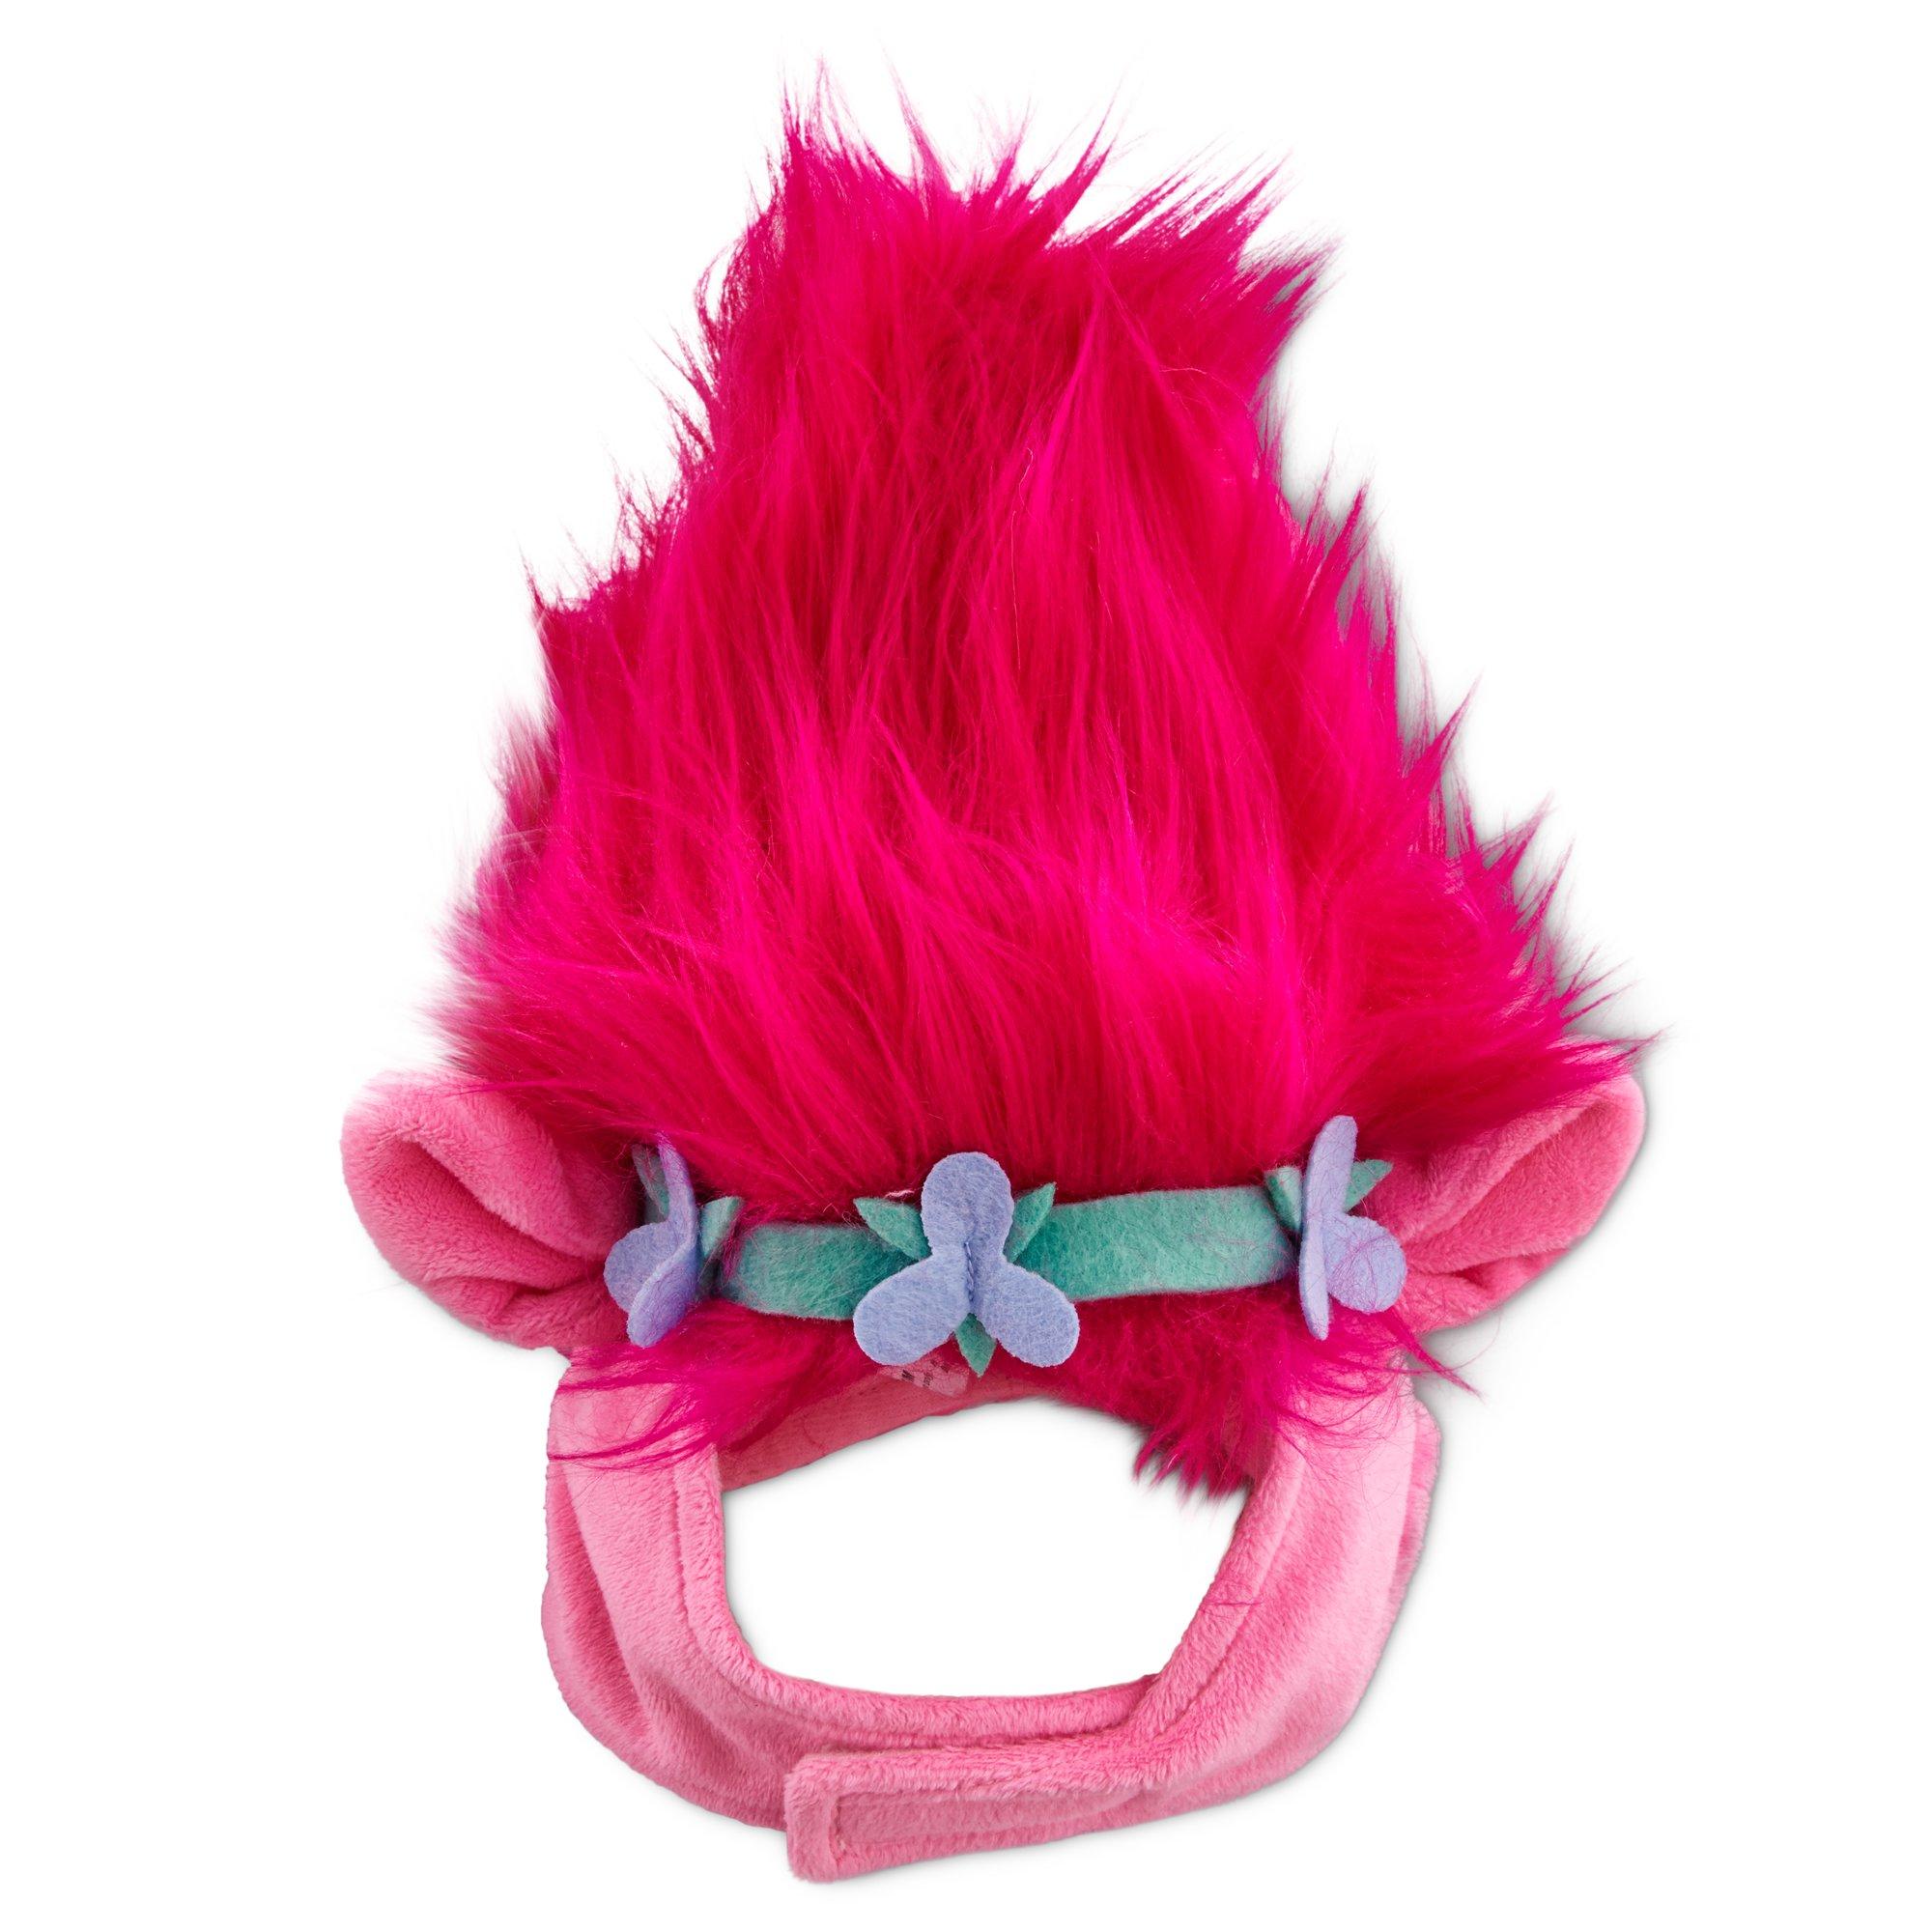 Trolls Poppy Headpiece